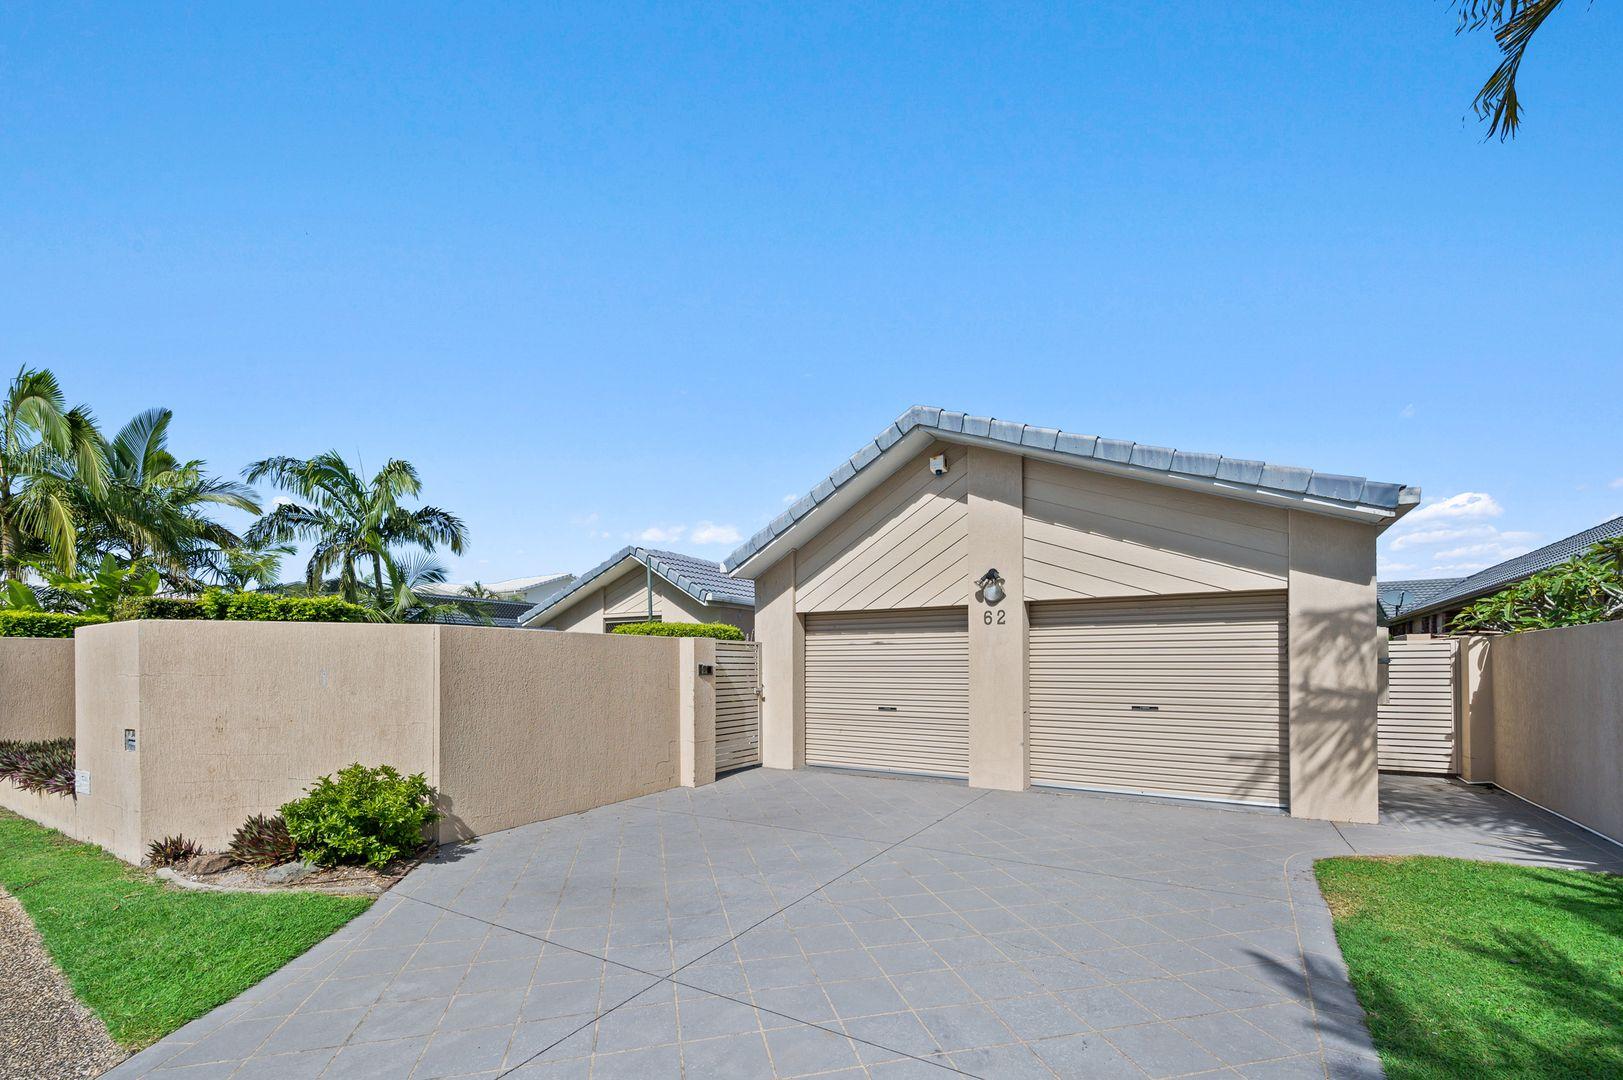 62 Lae Drive, Runaway Bay QLD 4216, Image 1